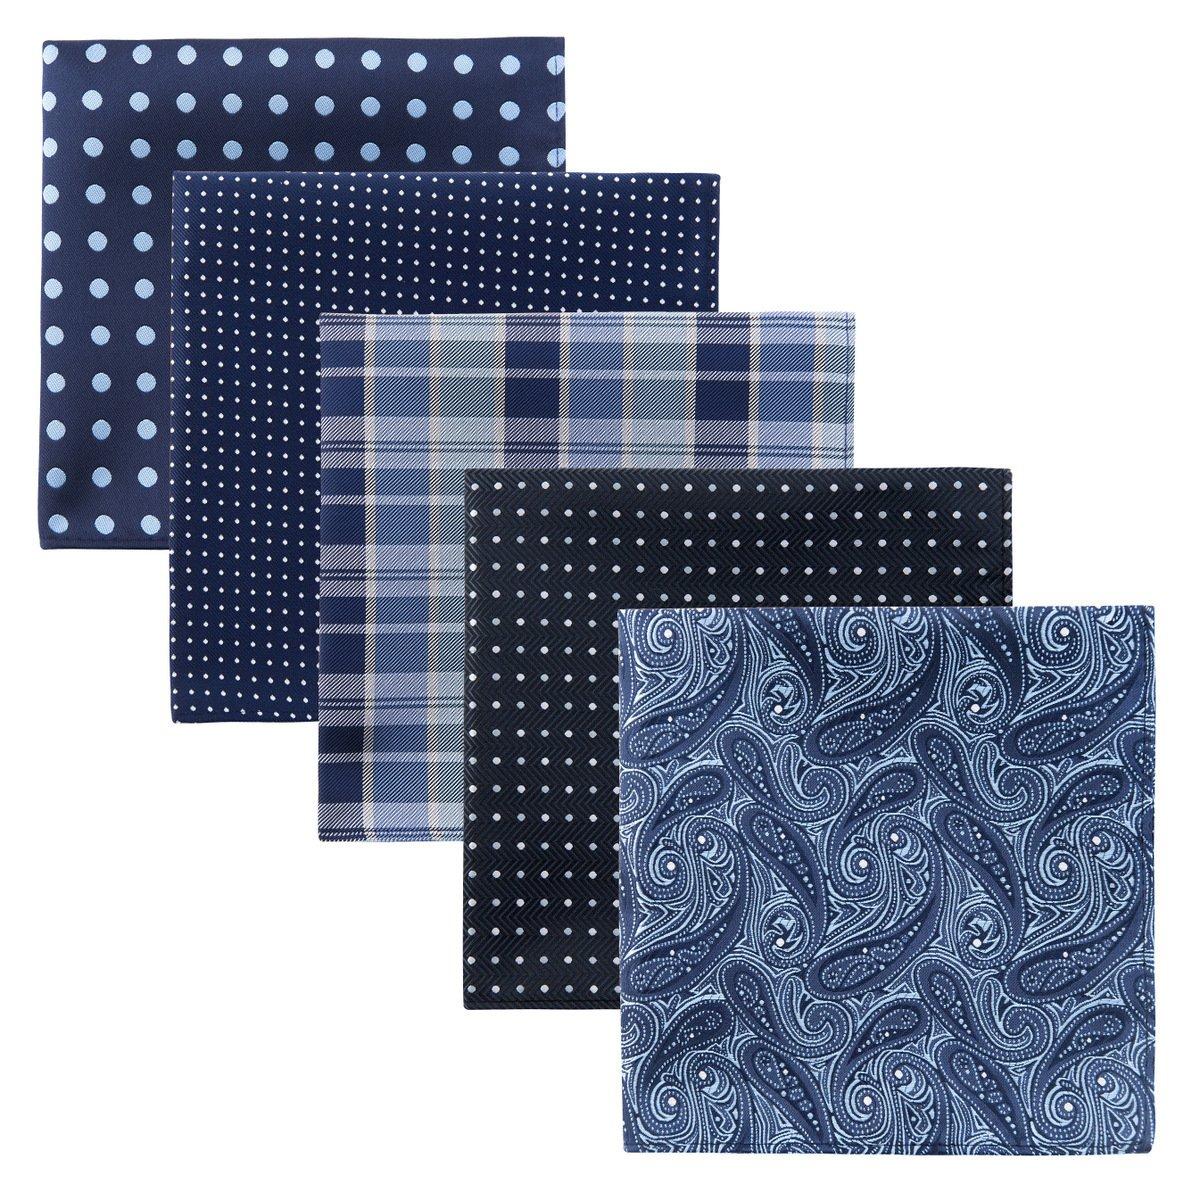 Retreez 5 Piece Assorted Woven Microfiber Premium Pocket Square Gift Box Set - Set 006 by Retreez